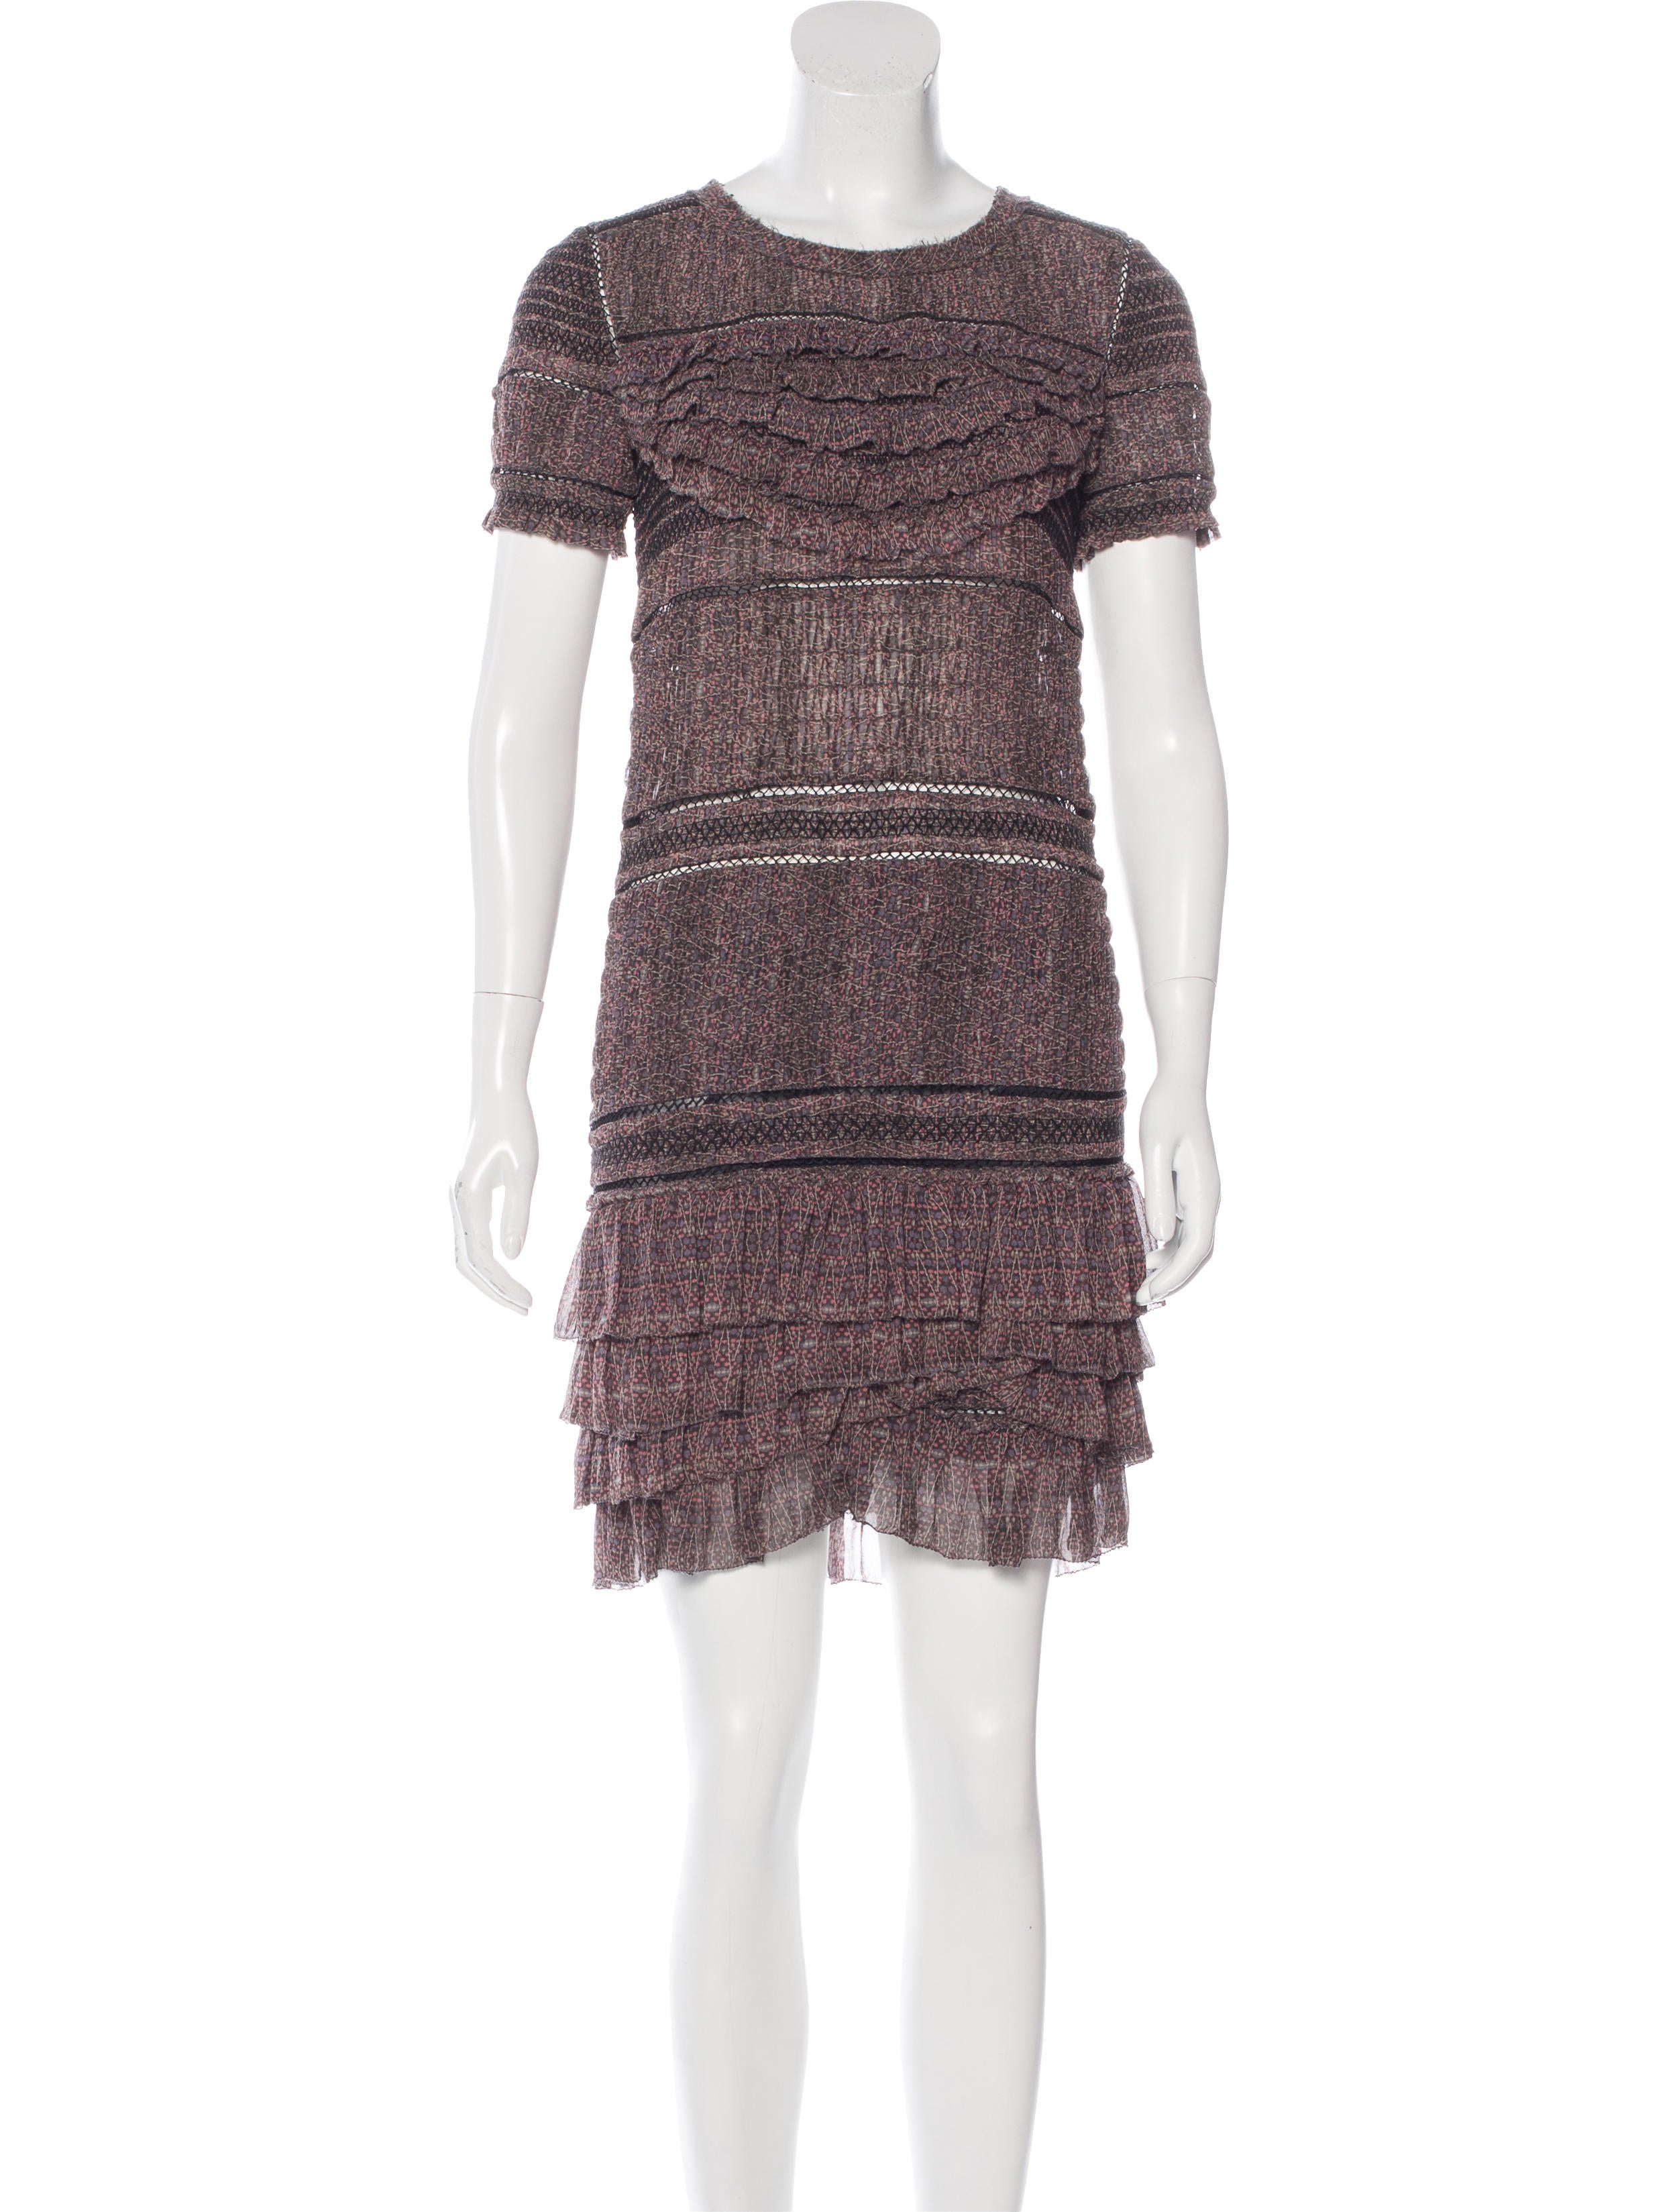 Isabel marant silk mini dress clothing isa40698 the for Isabel marant shirt dress